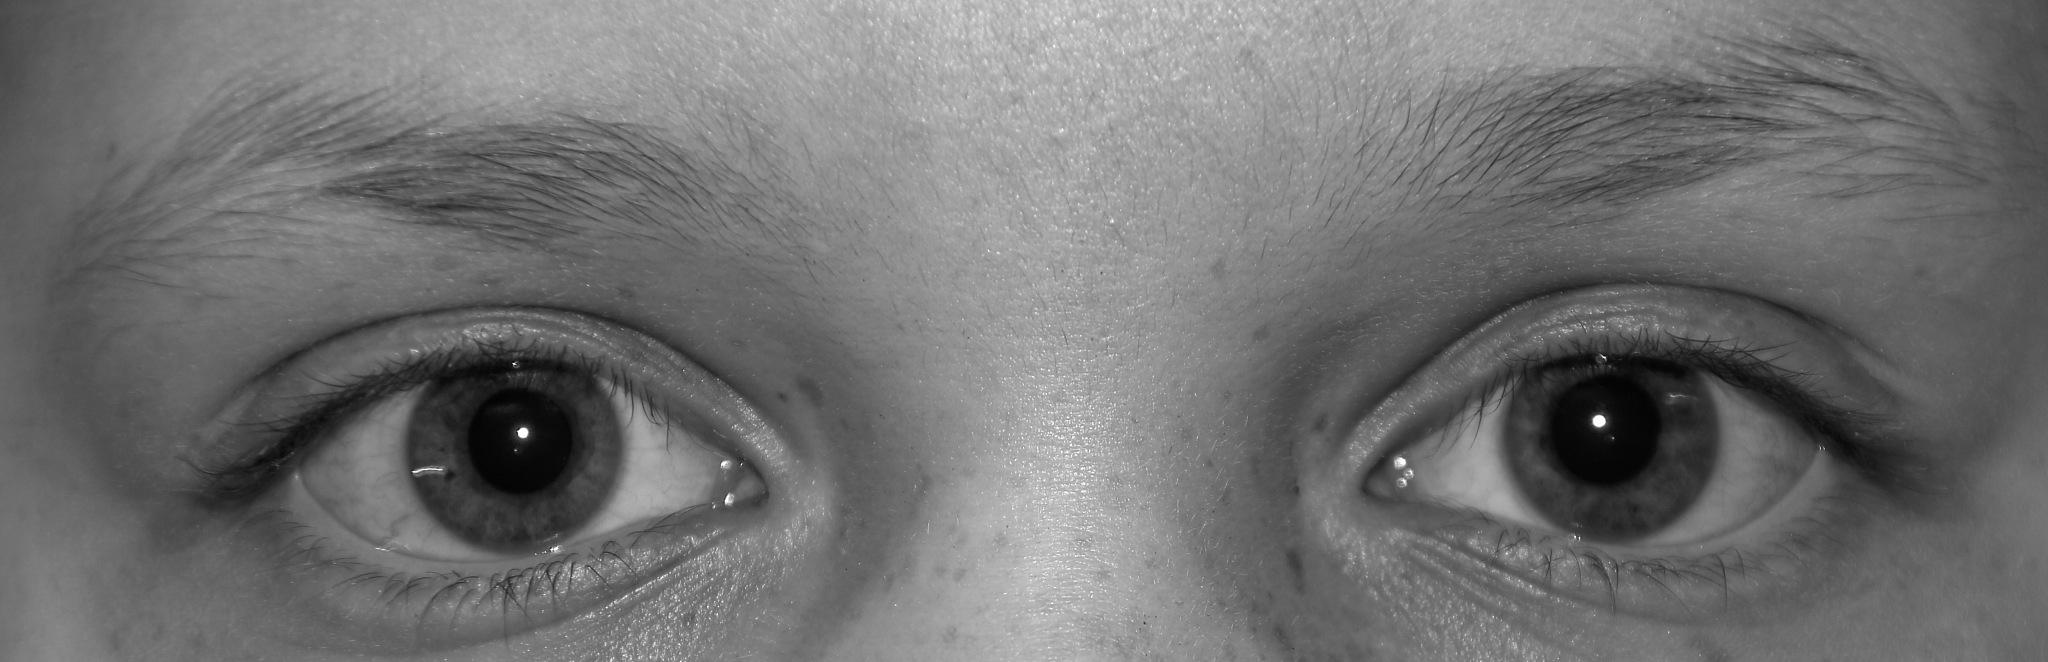 Eyes by Kuba Šír